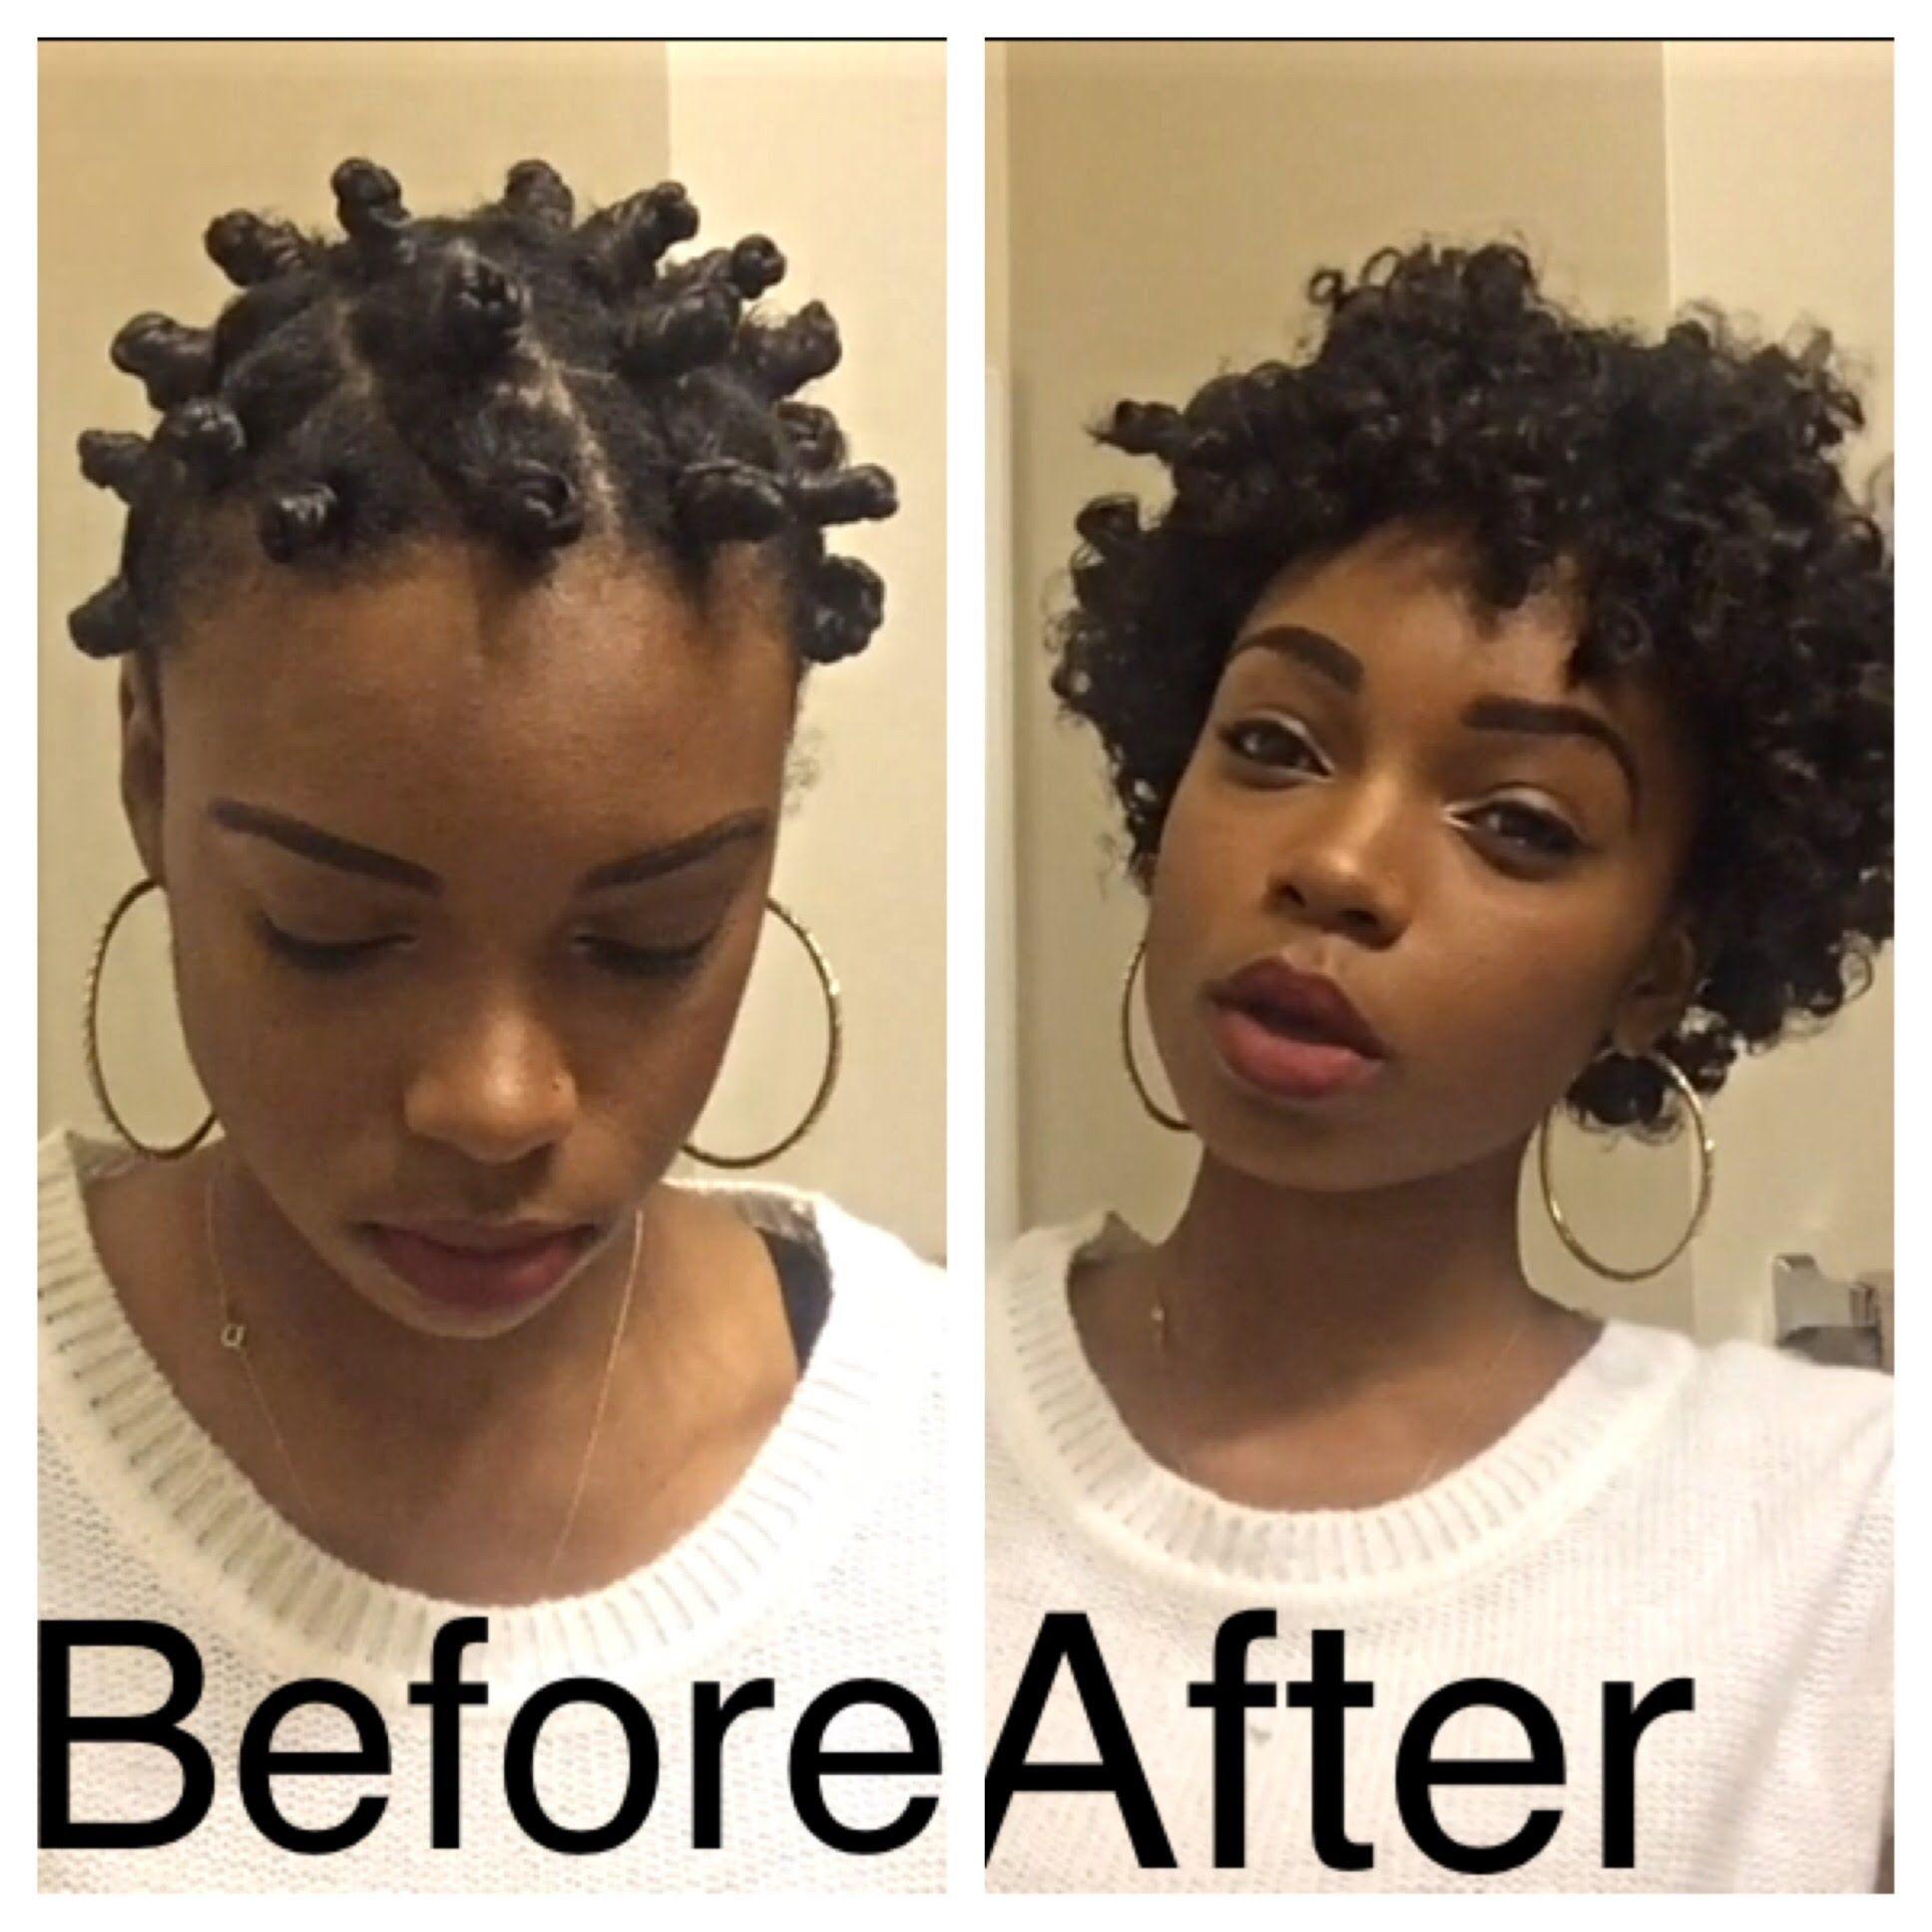 Short Hair Bantu Knot Out Natural Hair Pinterest Natural Hair